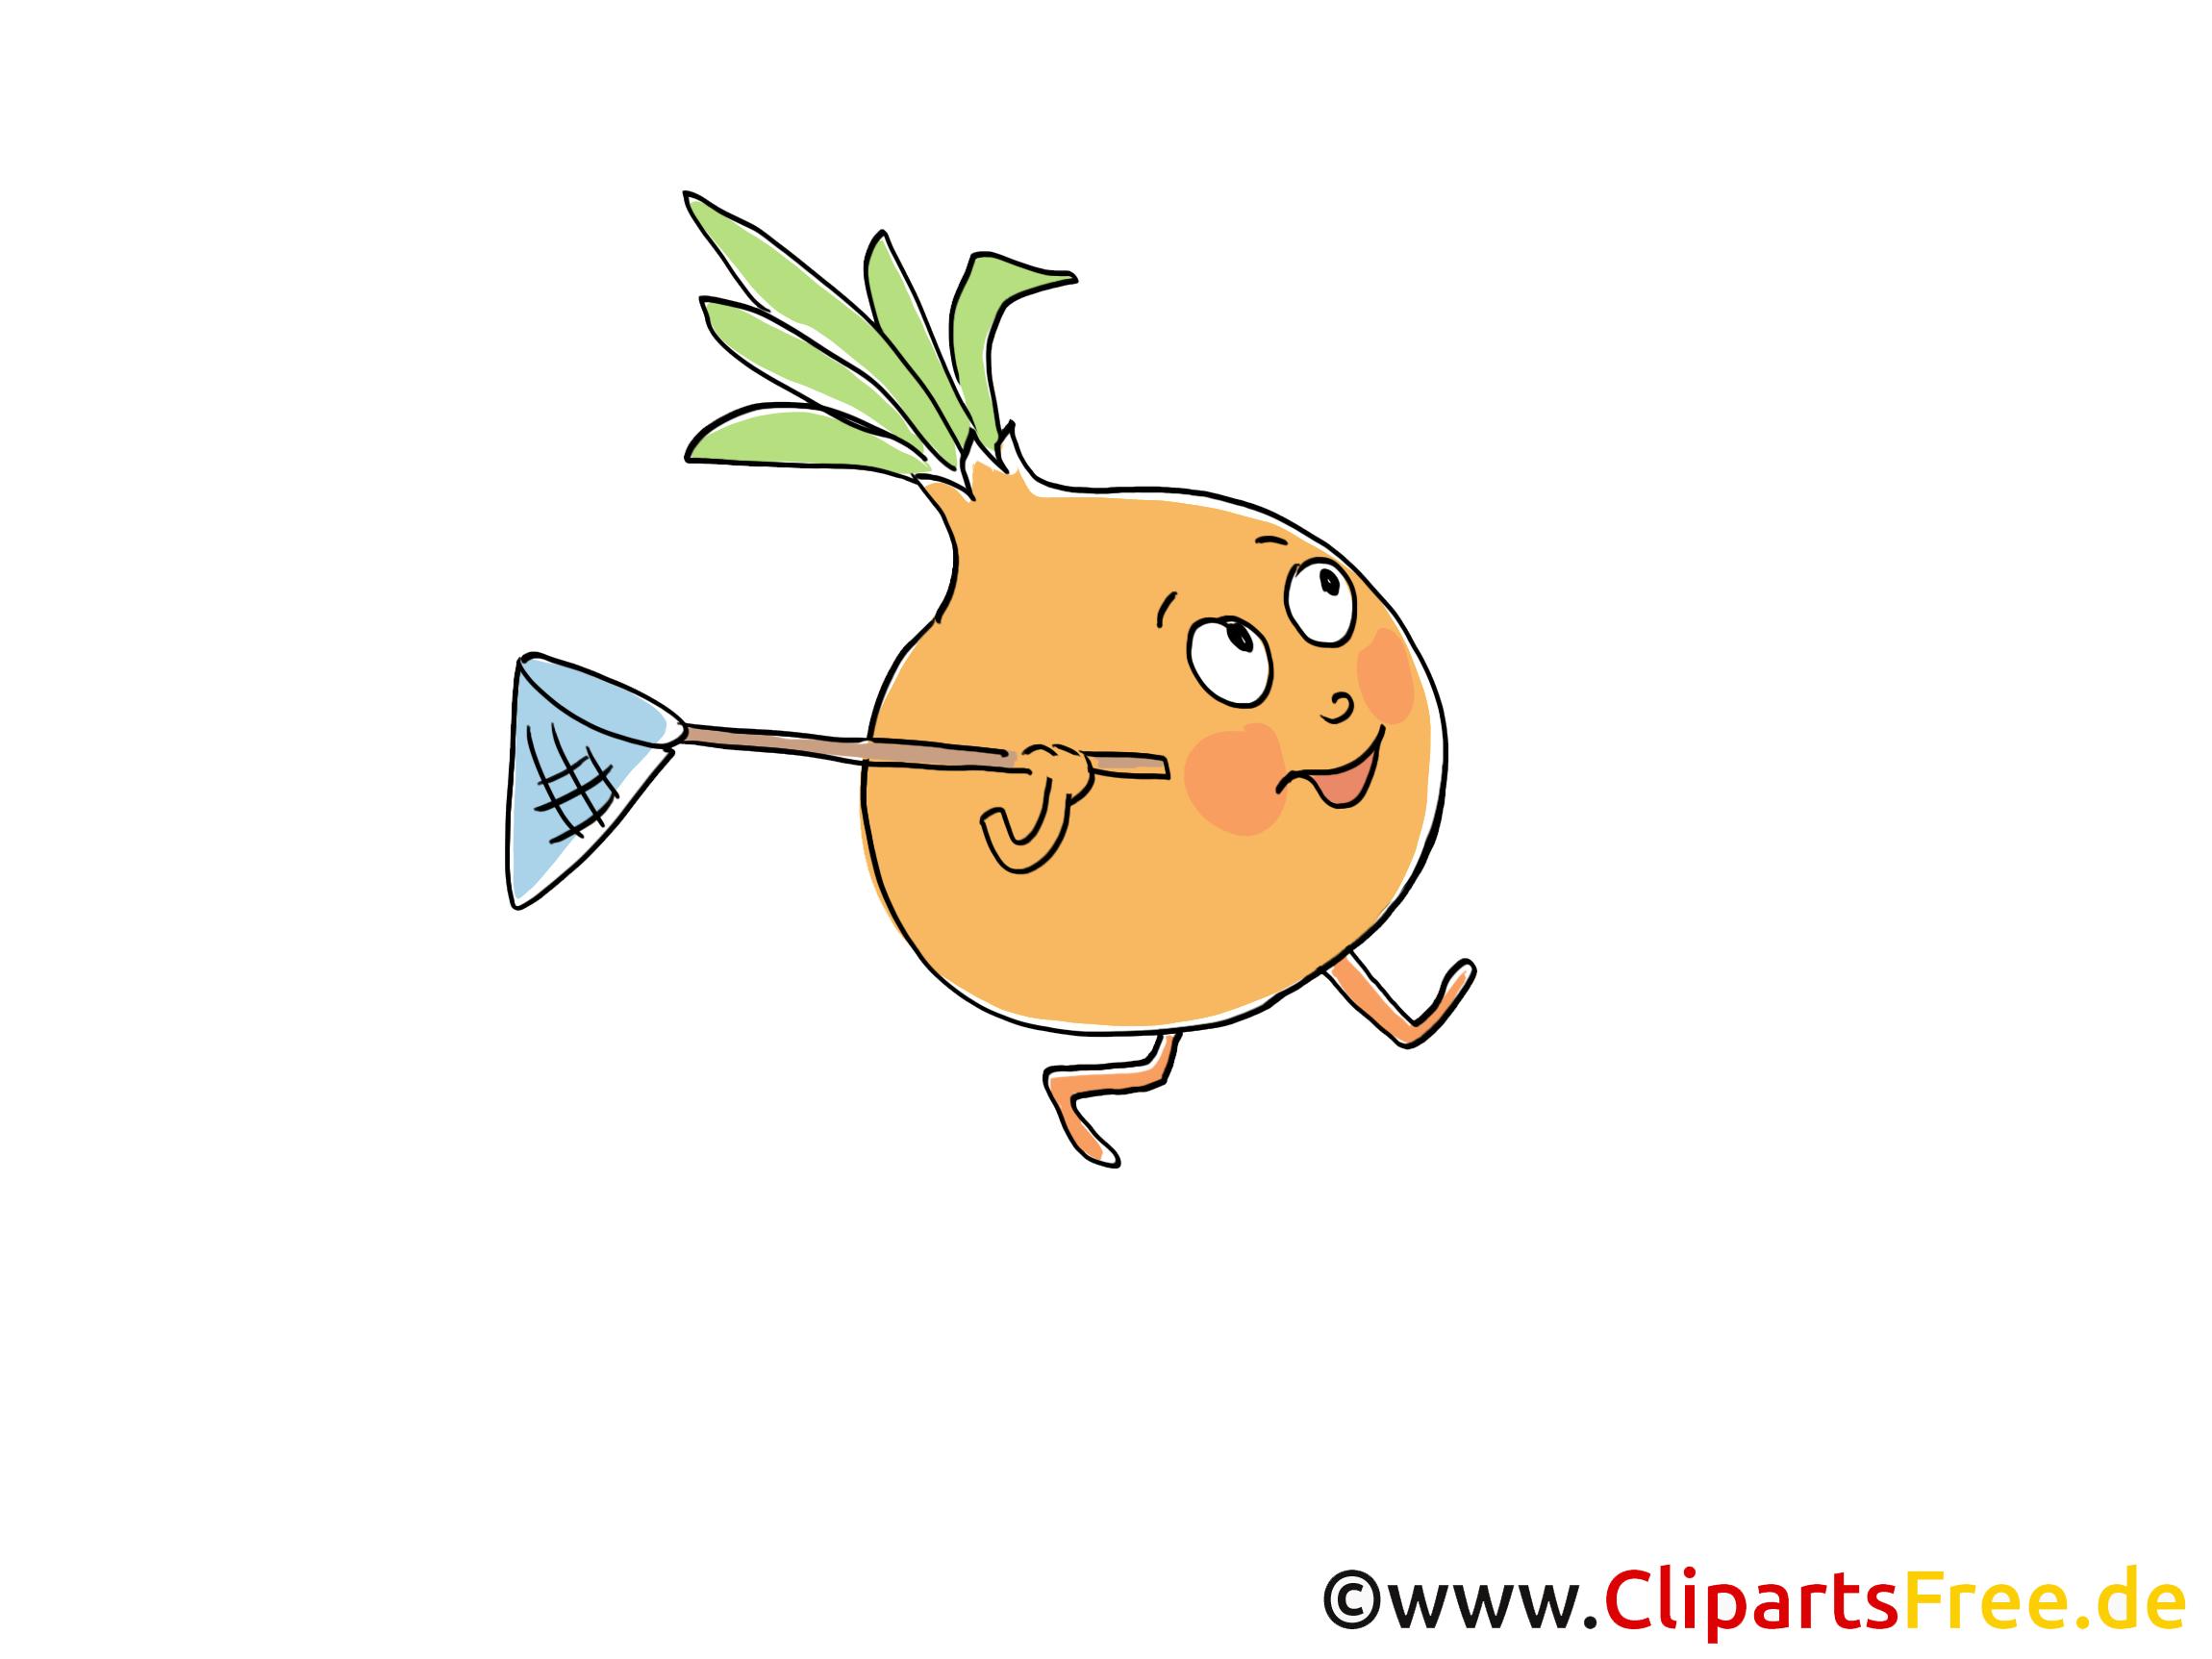 Zwiebel Clip Art, Illustration, Bild, Cartoon